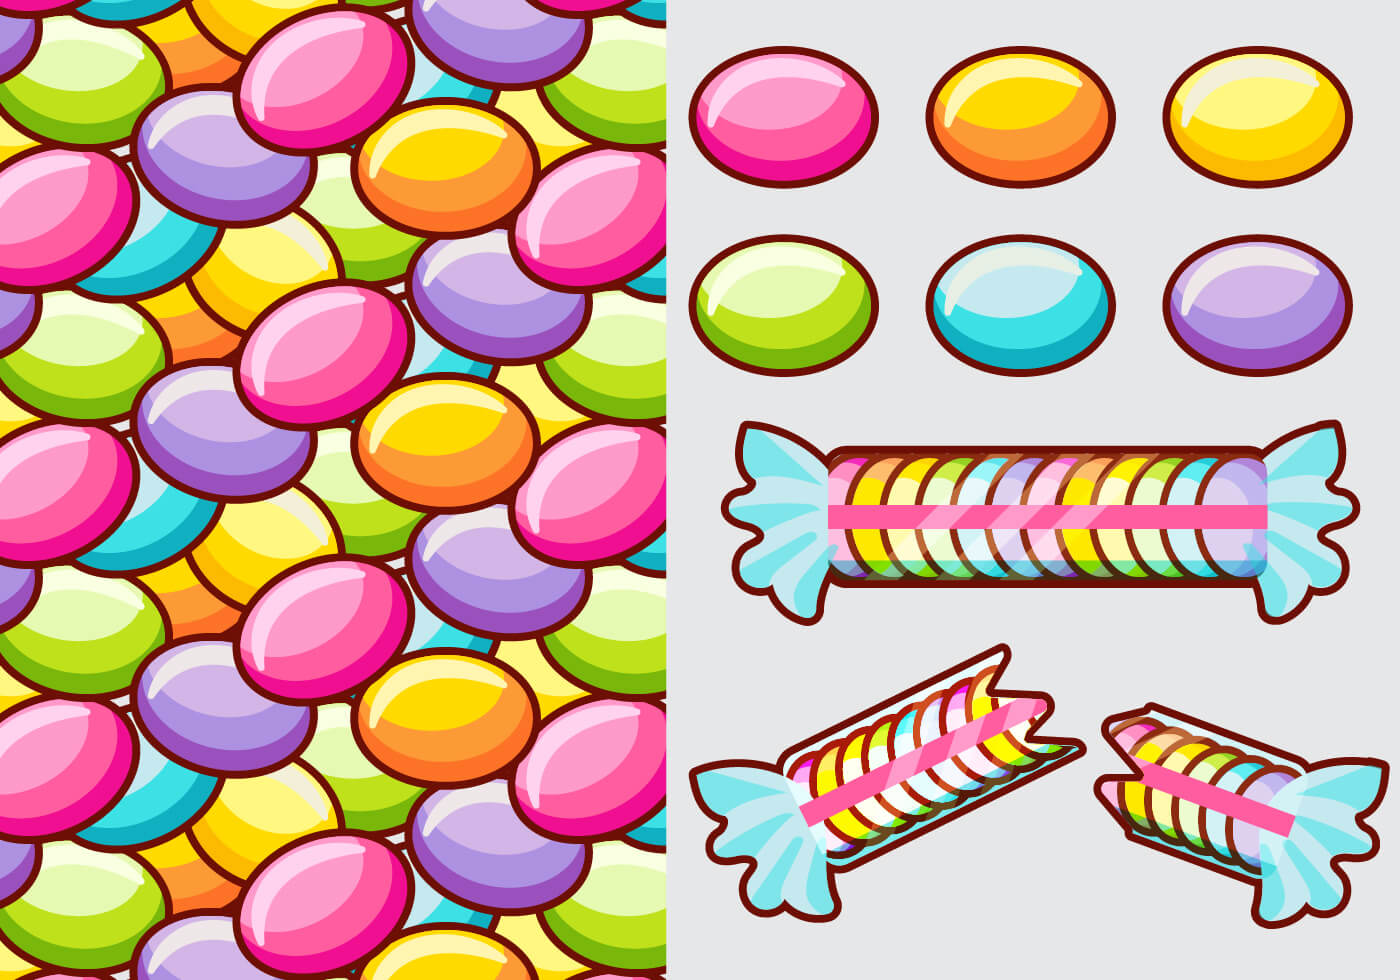 Smarties Candy Vector Elements - Download Free Vector Art, Stock Graphics & Images